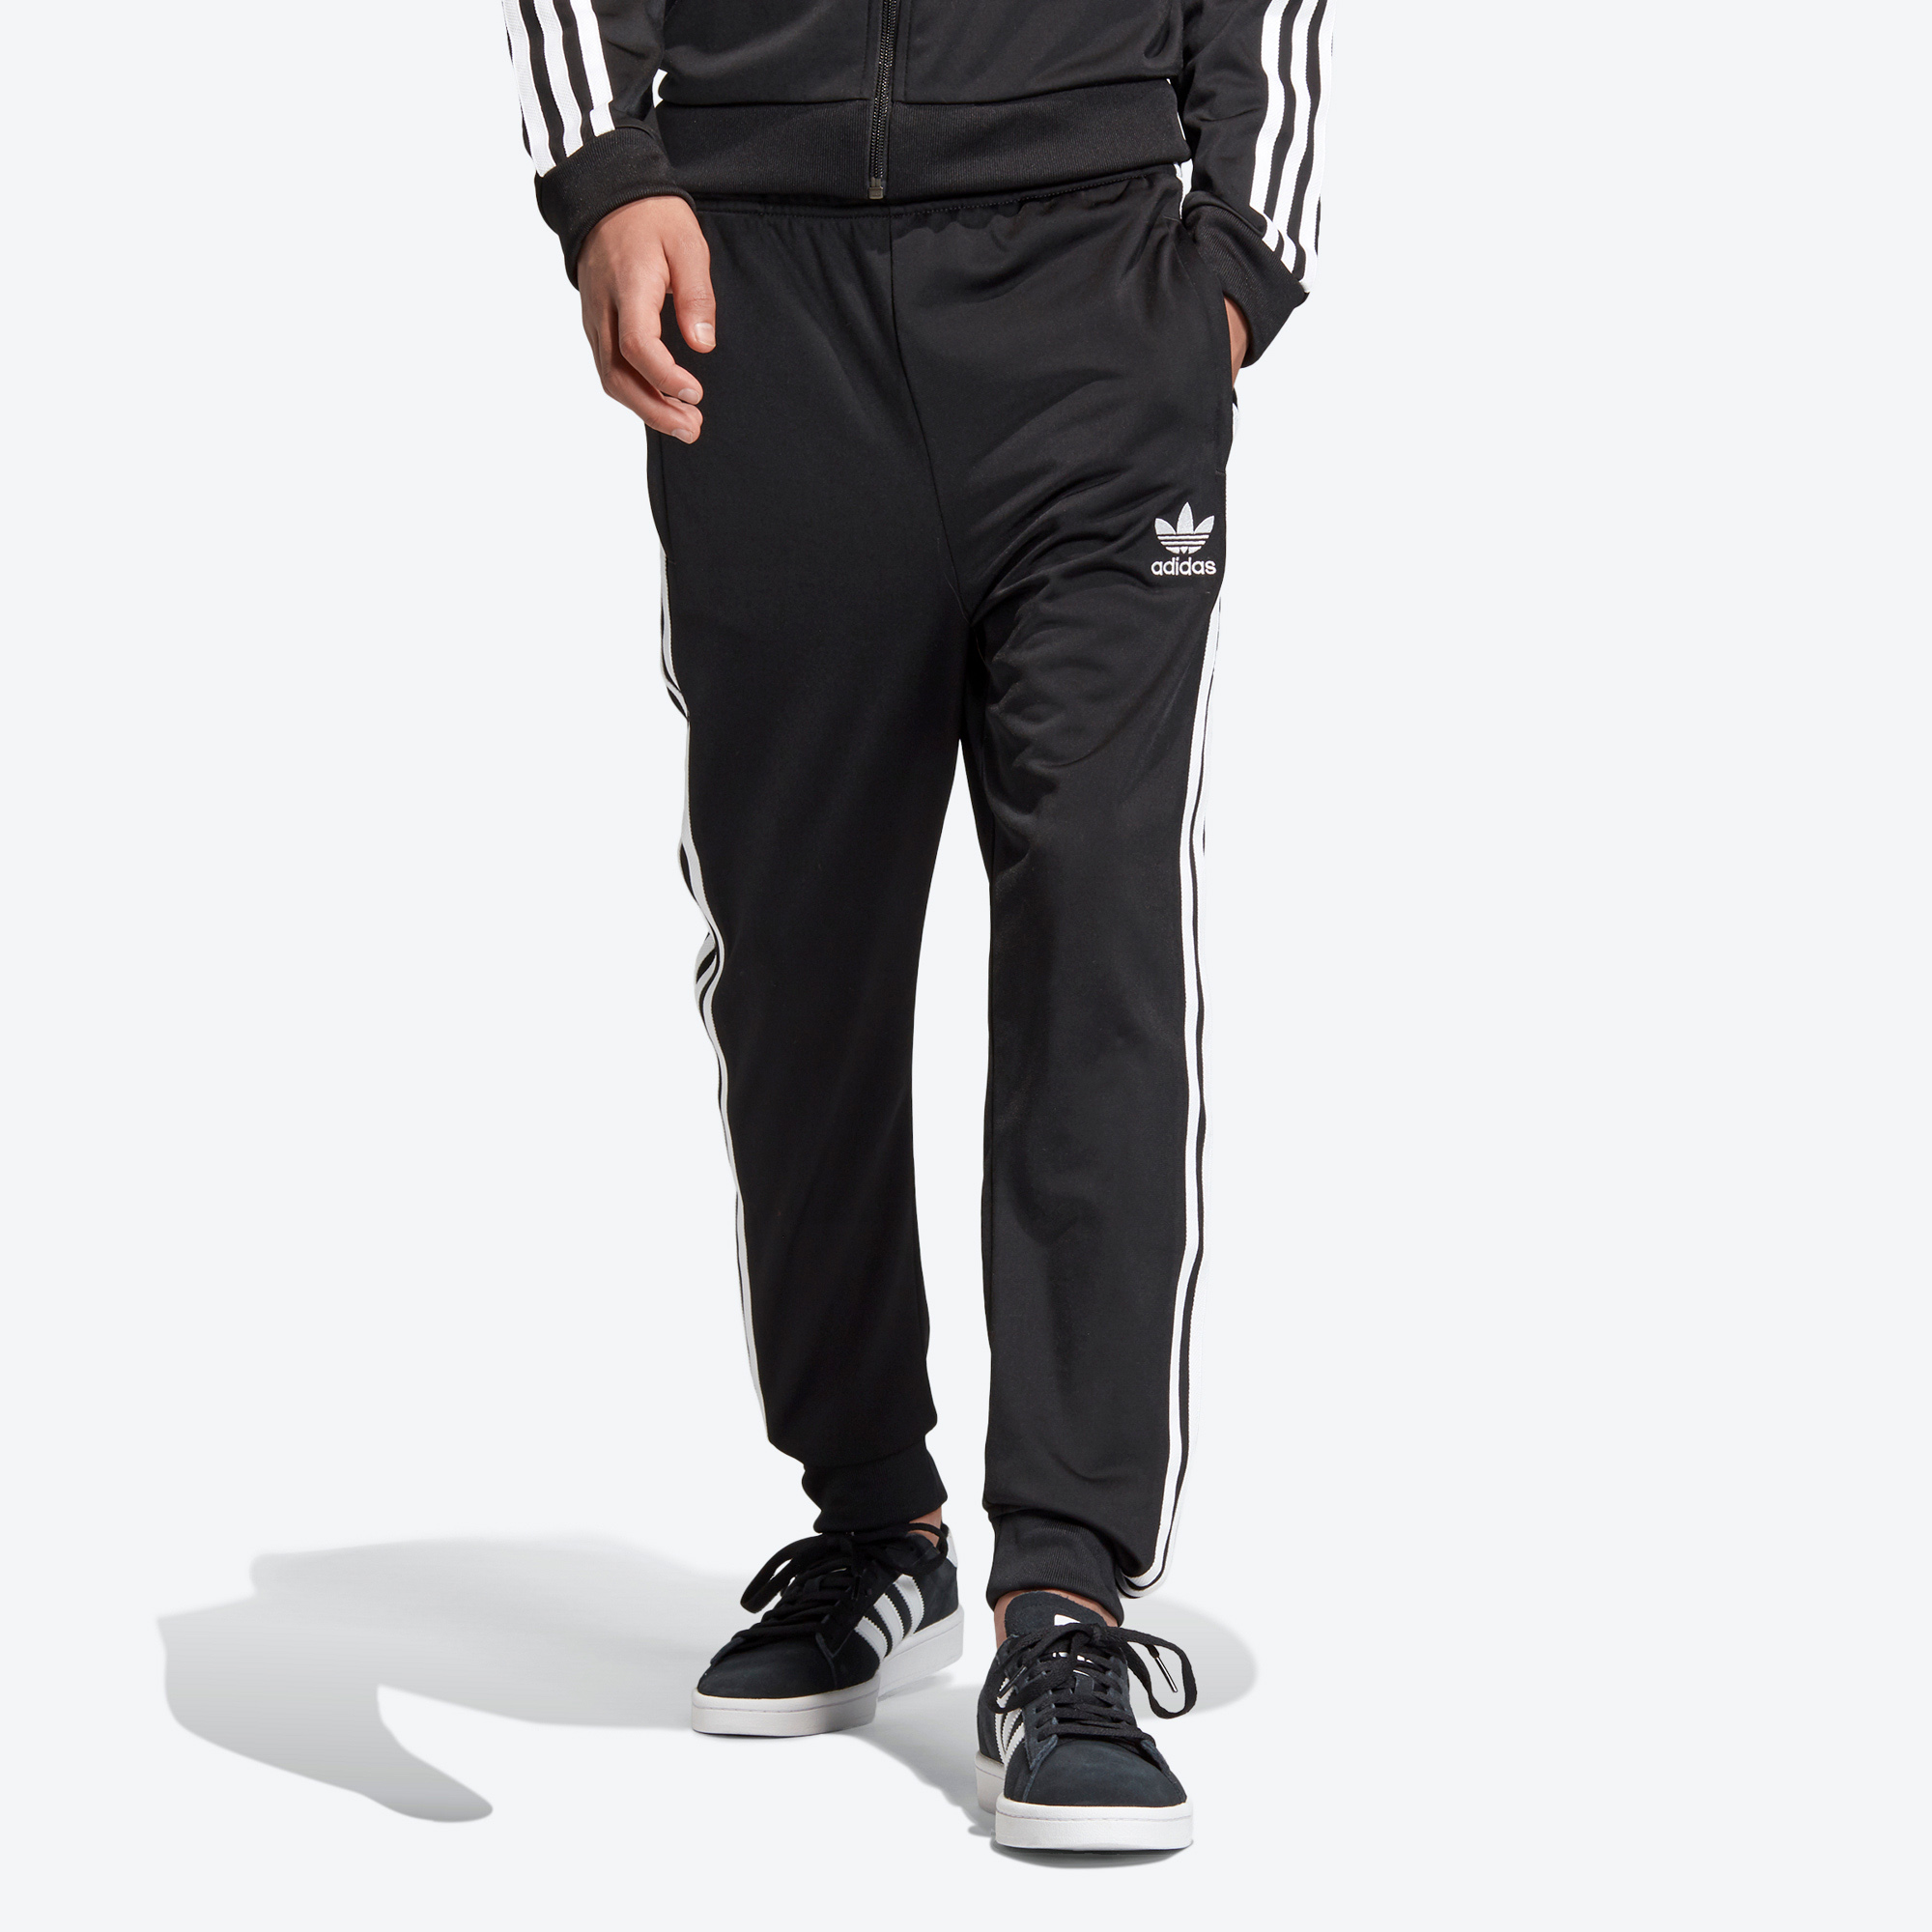 adidas Superstar Pants - Dv2879